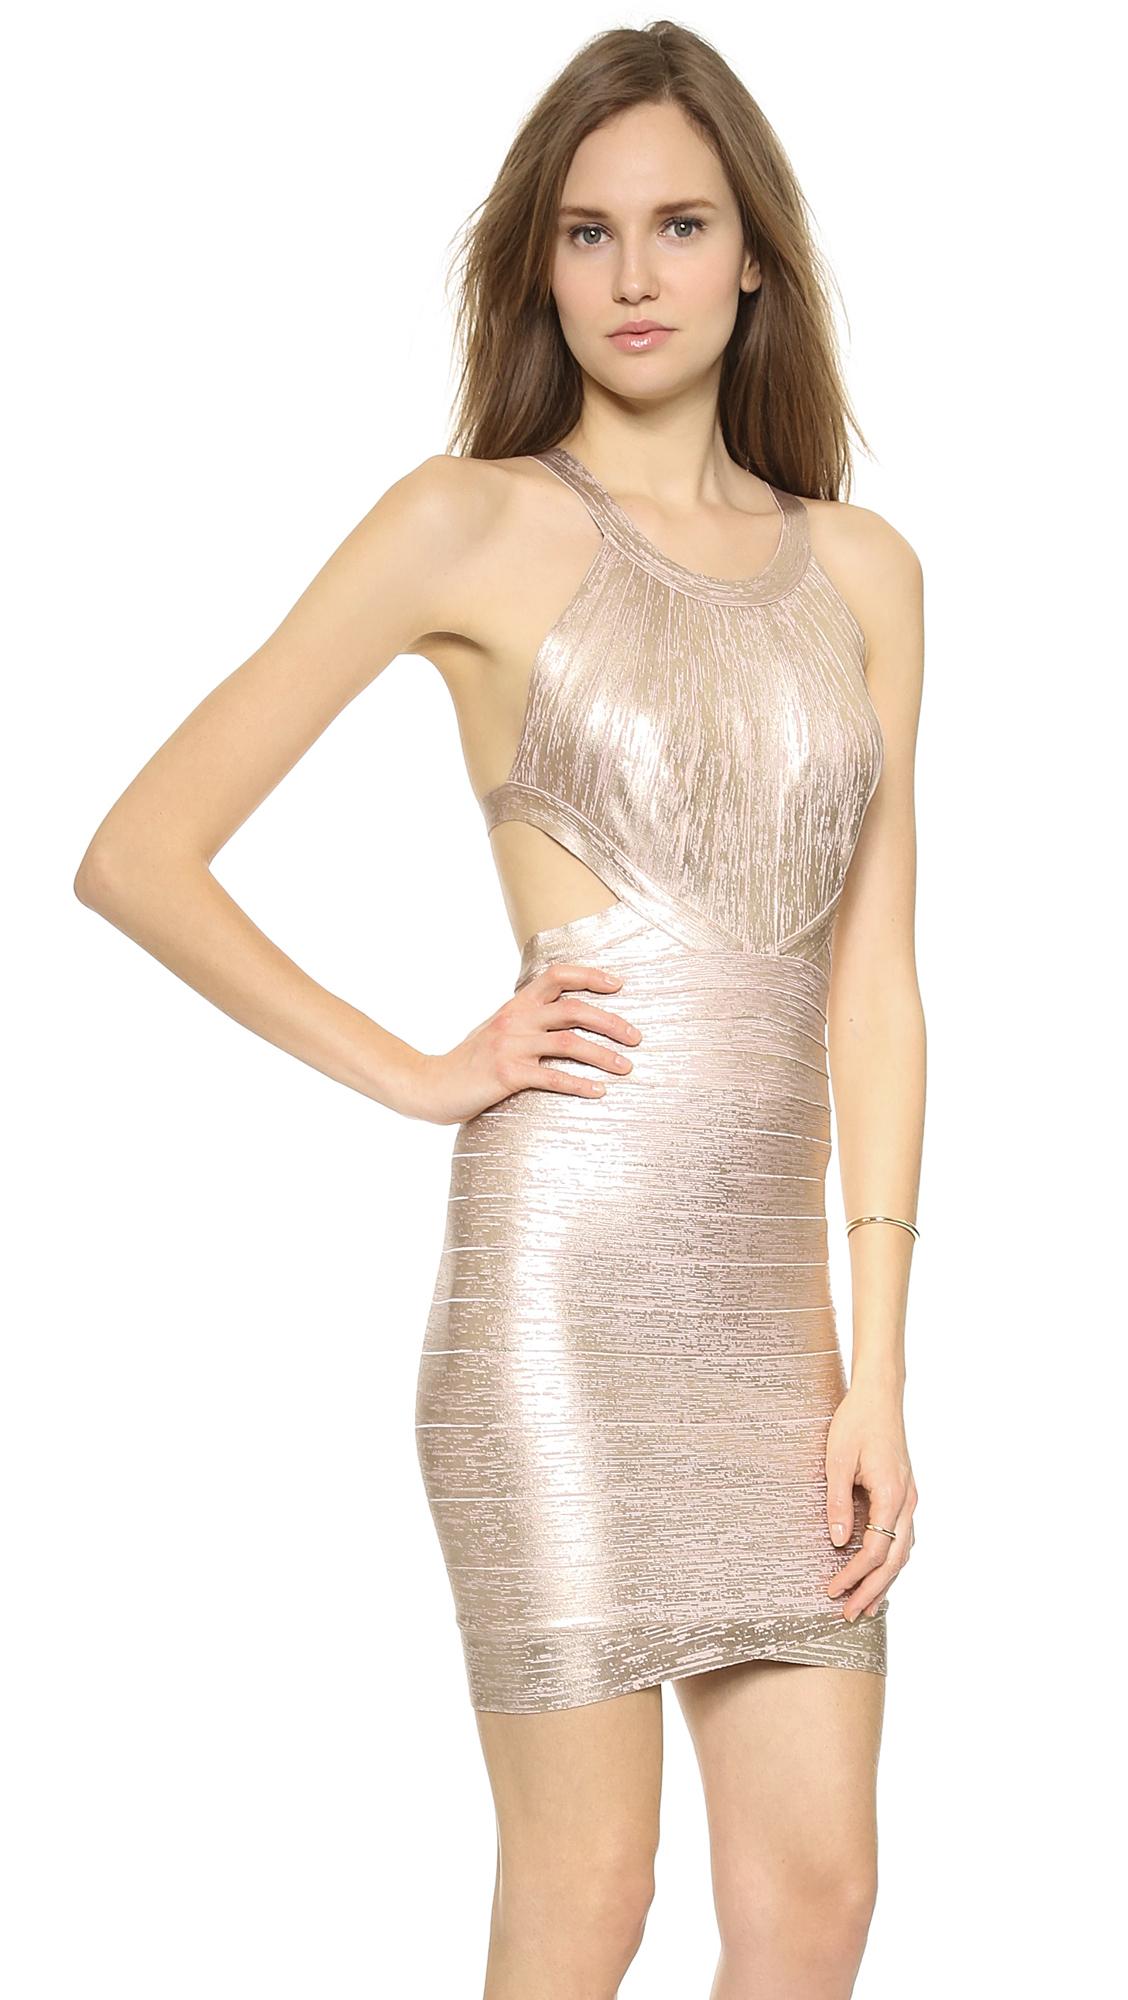 Rose Gold Cocktail Dress